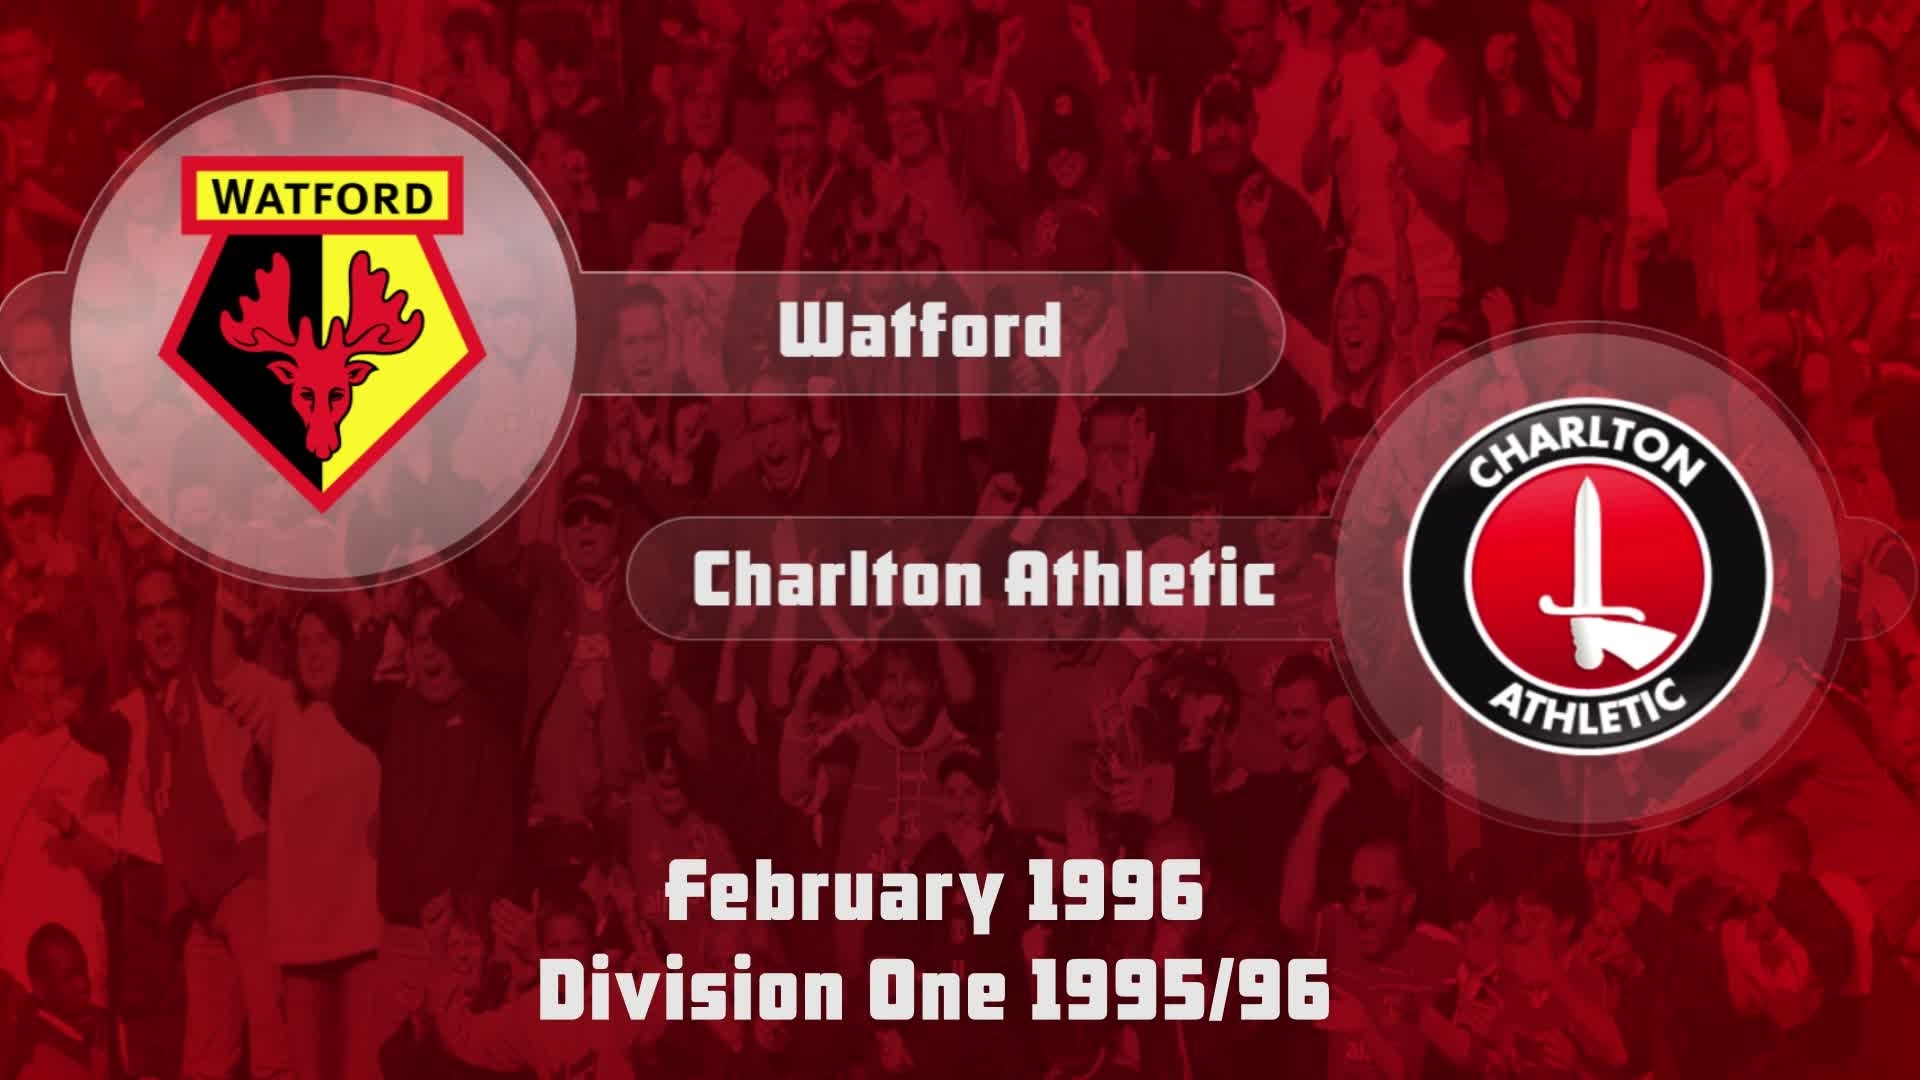 36 HIGHLIGHTS | Watford 1 Charlton 2 (Feb 1996)